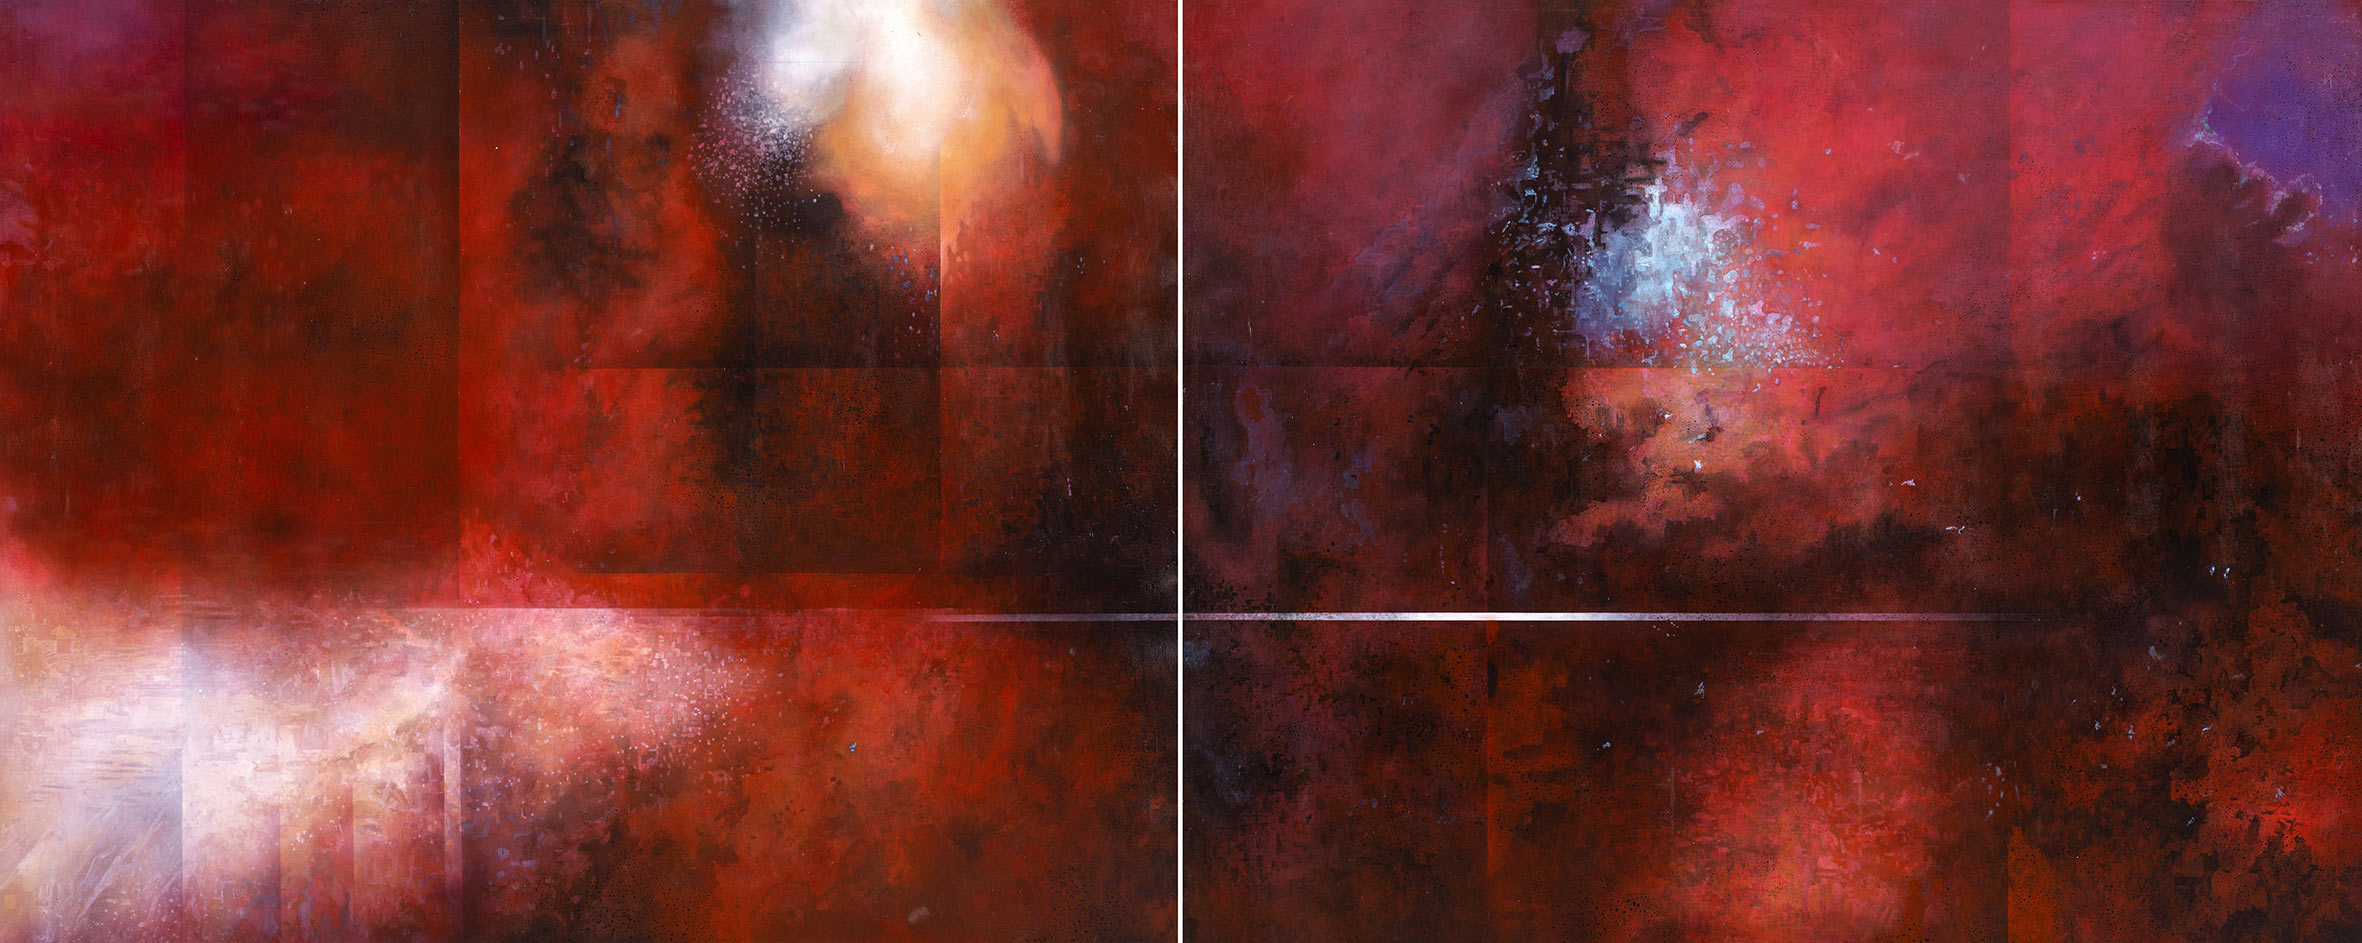 Leo Wang Stargazer Series II – Red Tide  2016 Oil on canvas  130x162cmx2